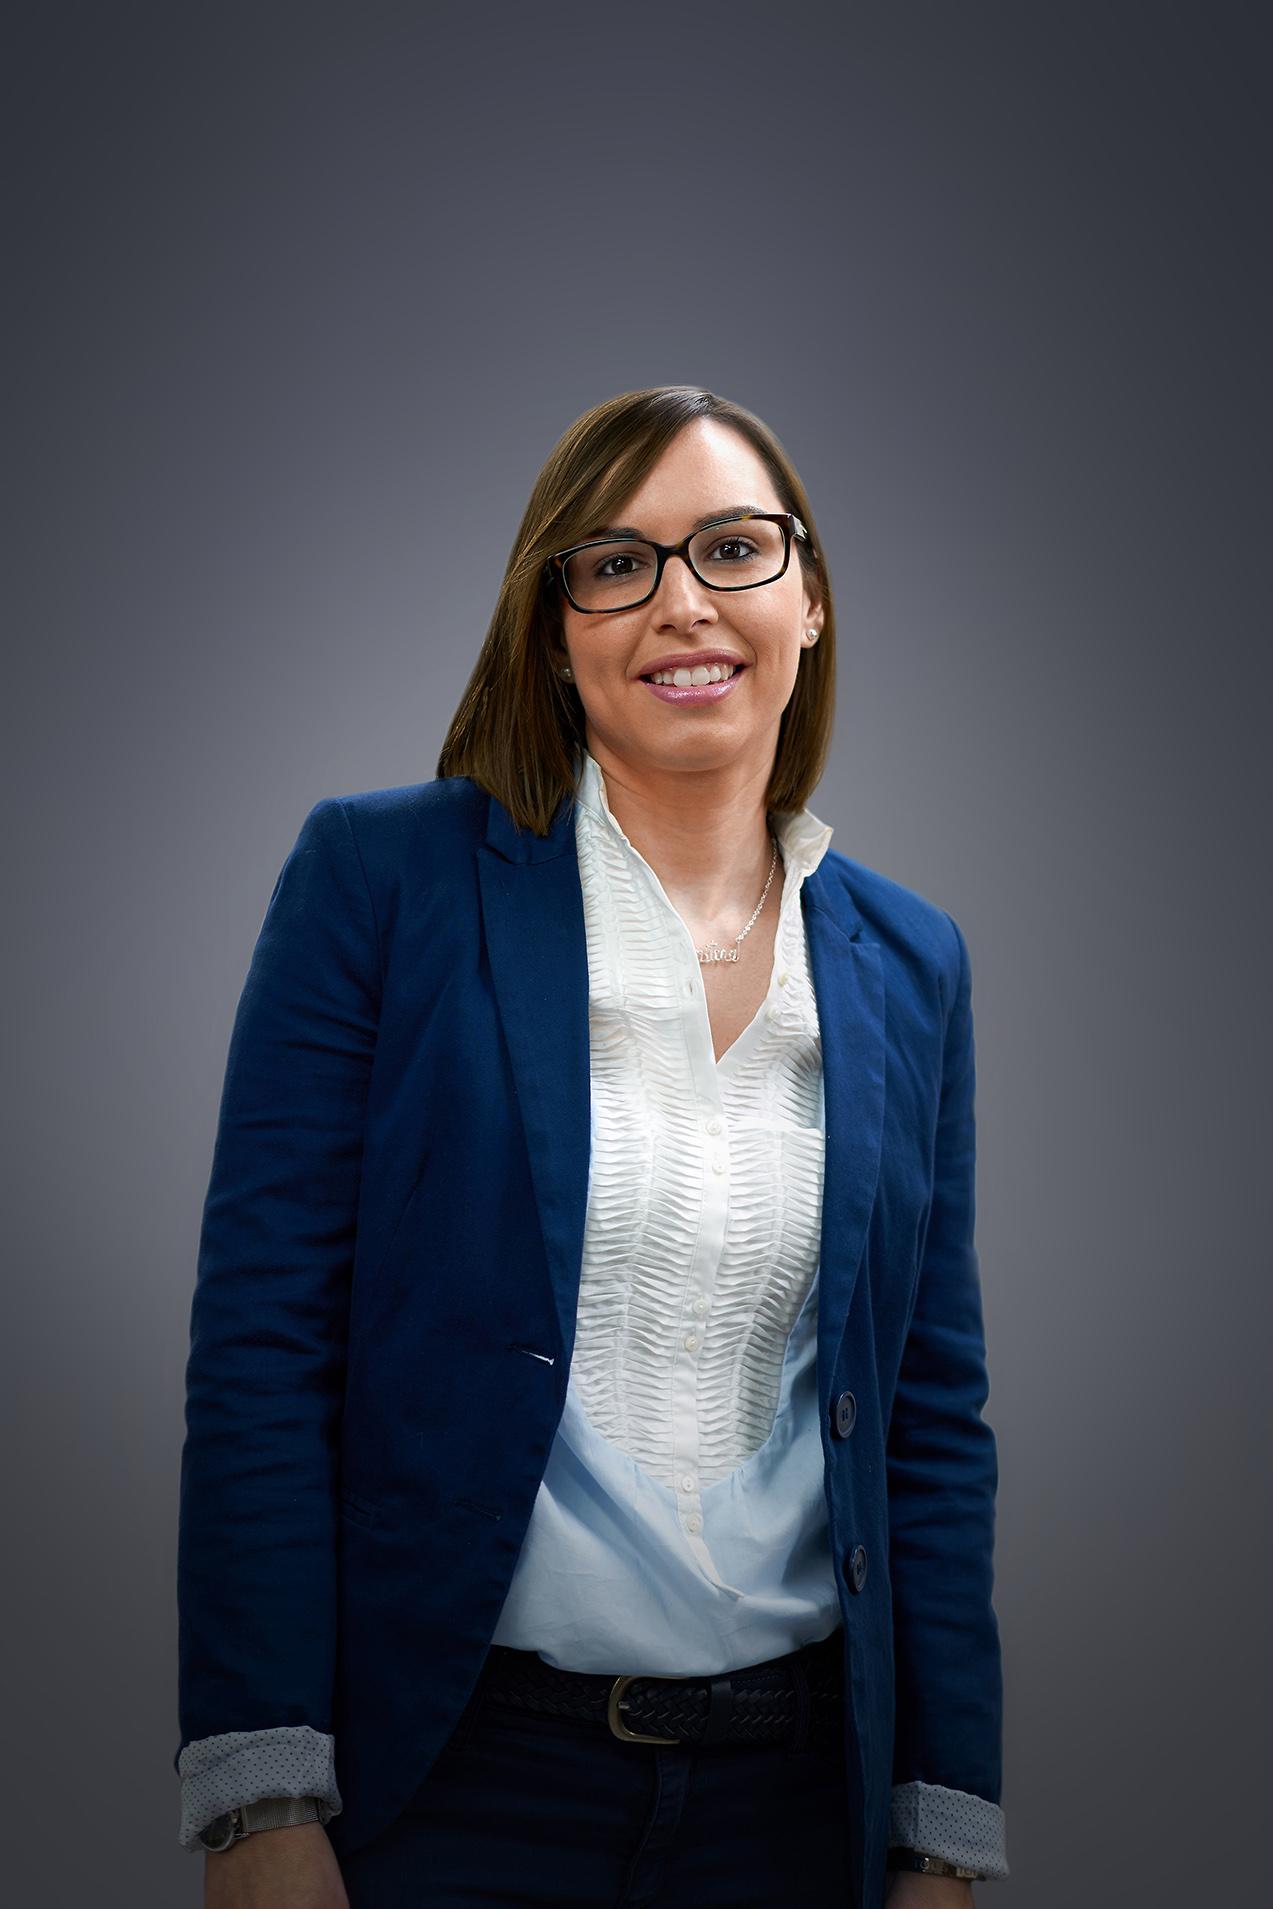 Cristina Pérez Sanconstantino